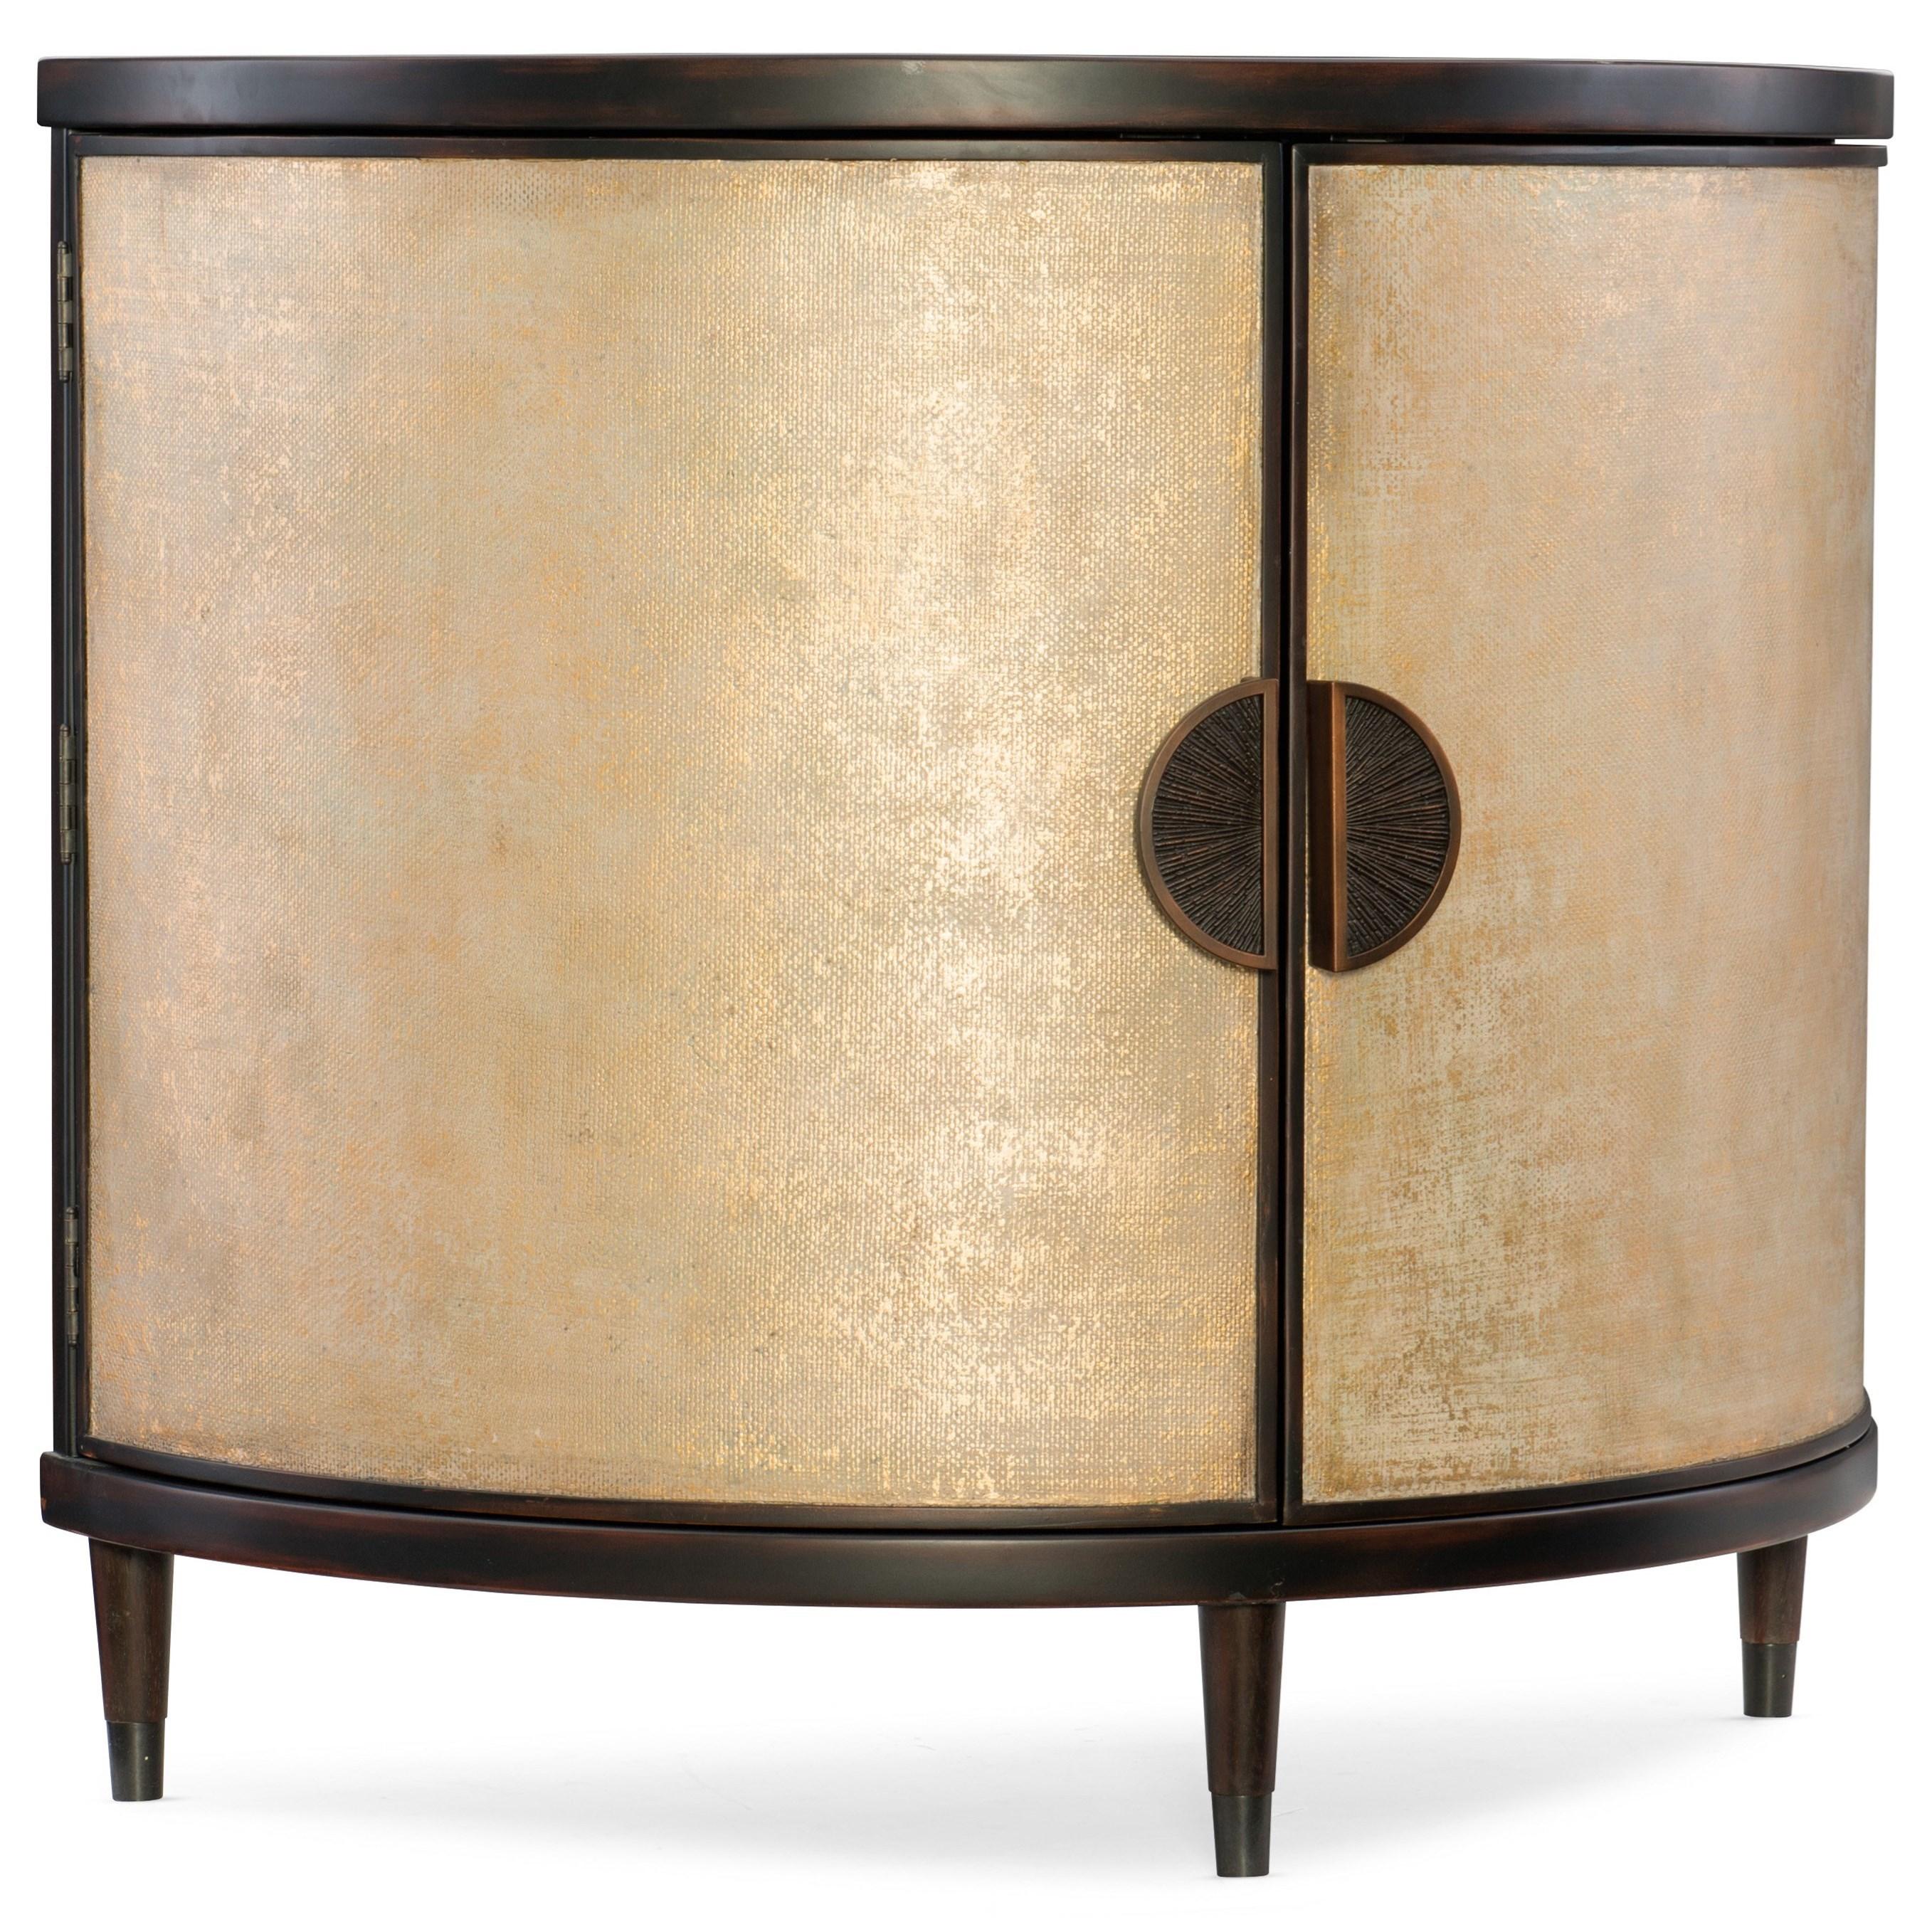 Mélange Em Demilune Accent Chest by Hooker Furniture at Stoney Creek Furniture